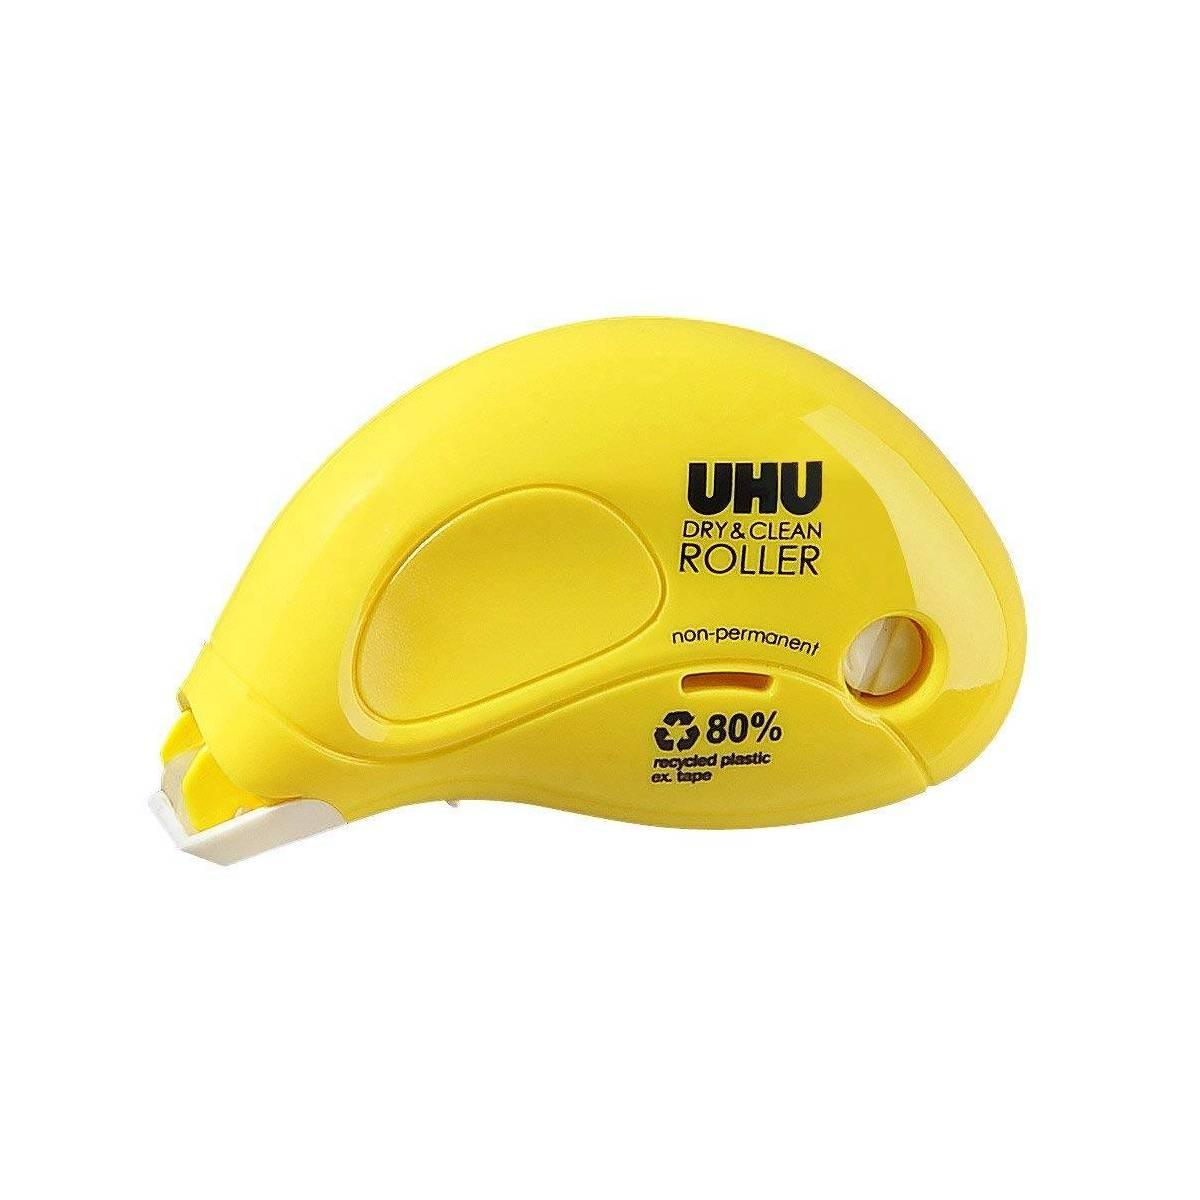 UHU - Glue roller Non Permanent 8,5 m